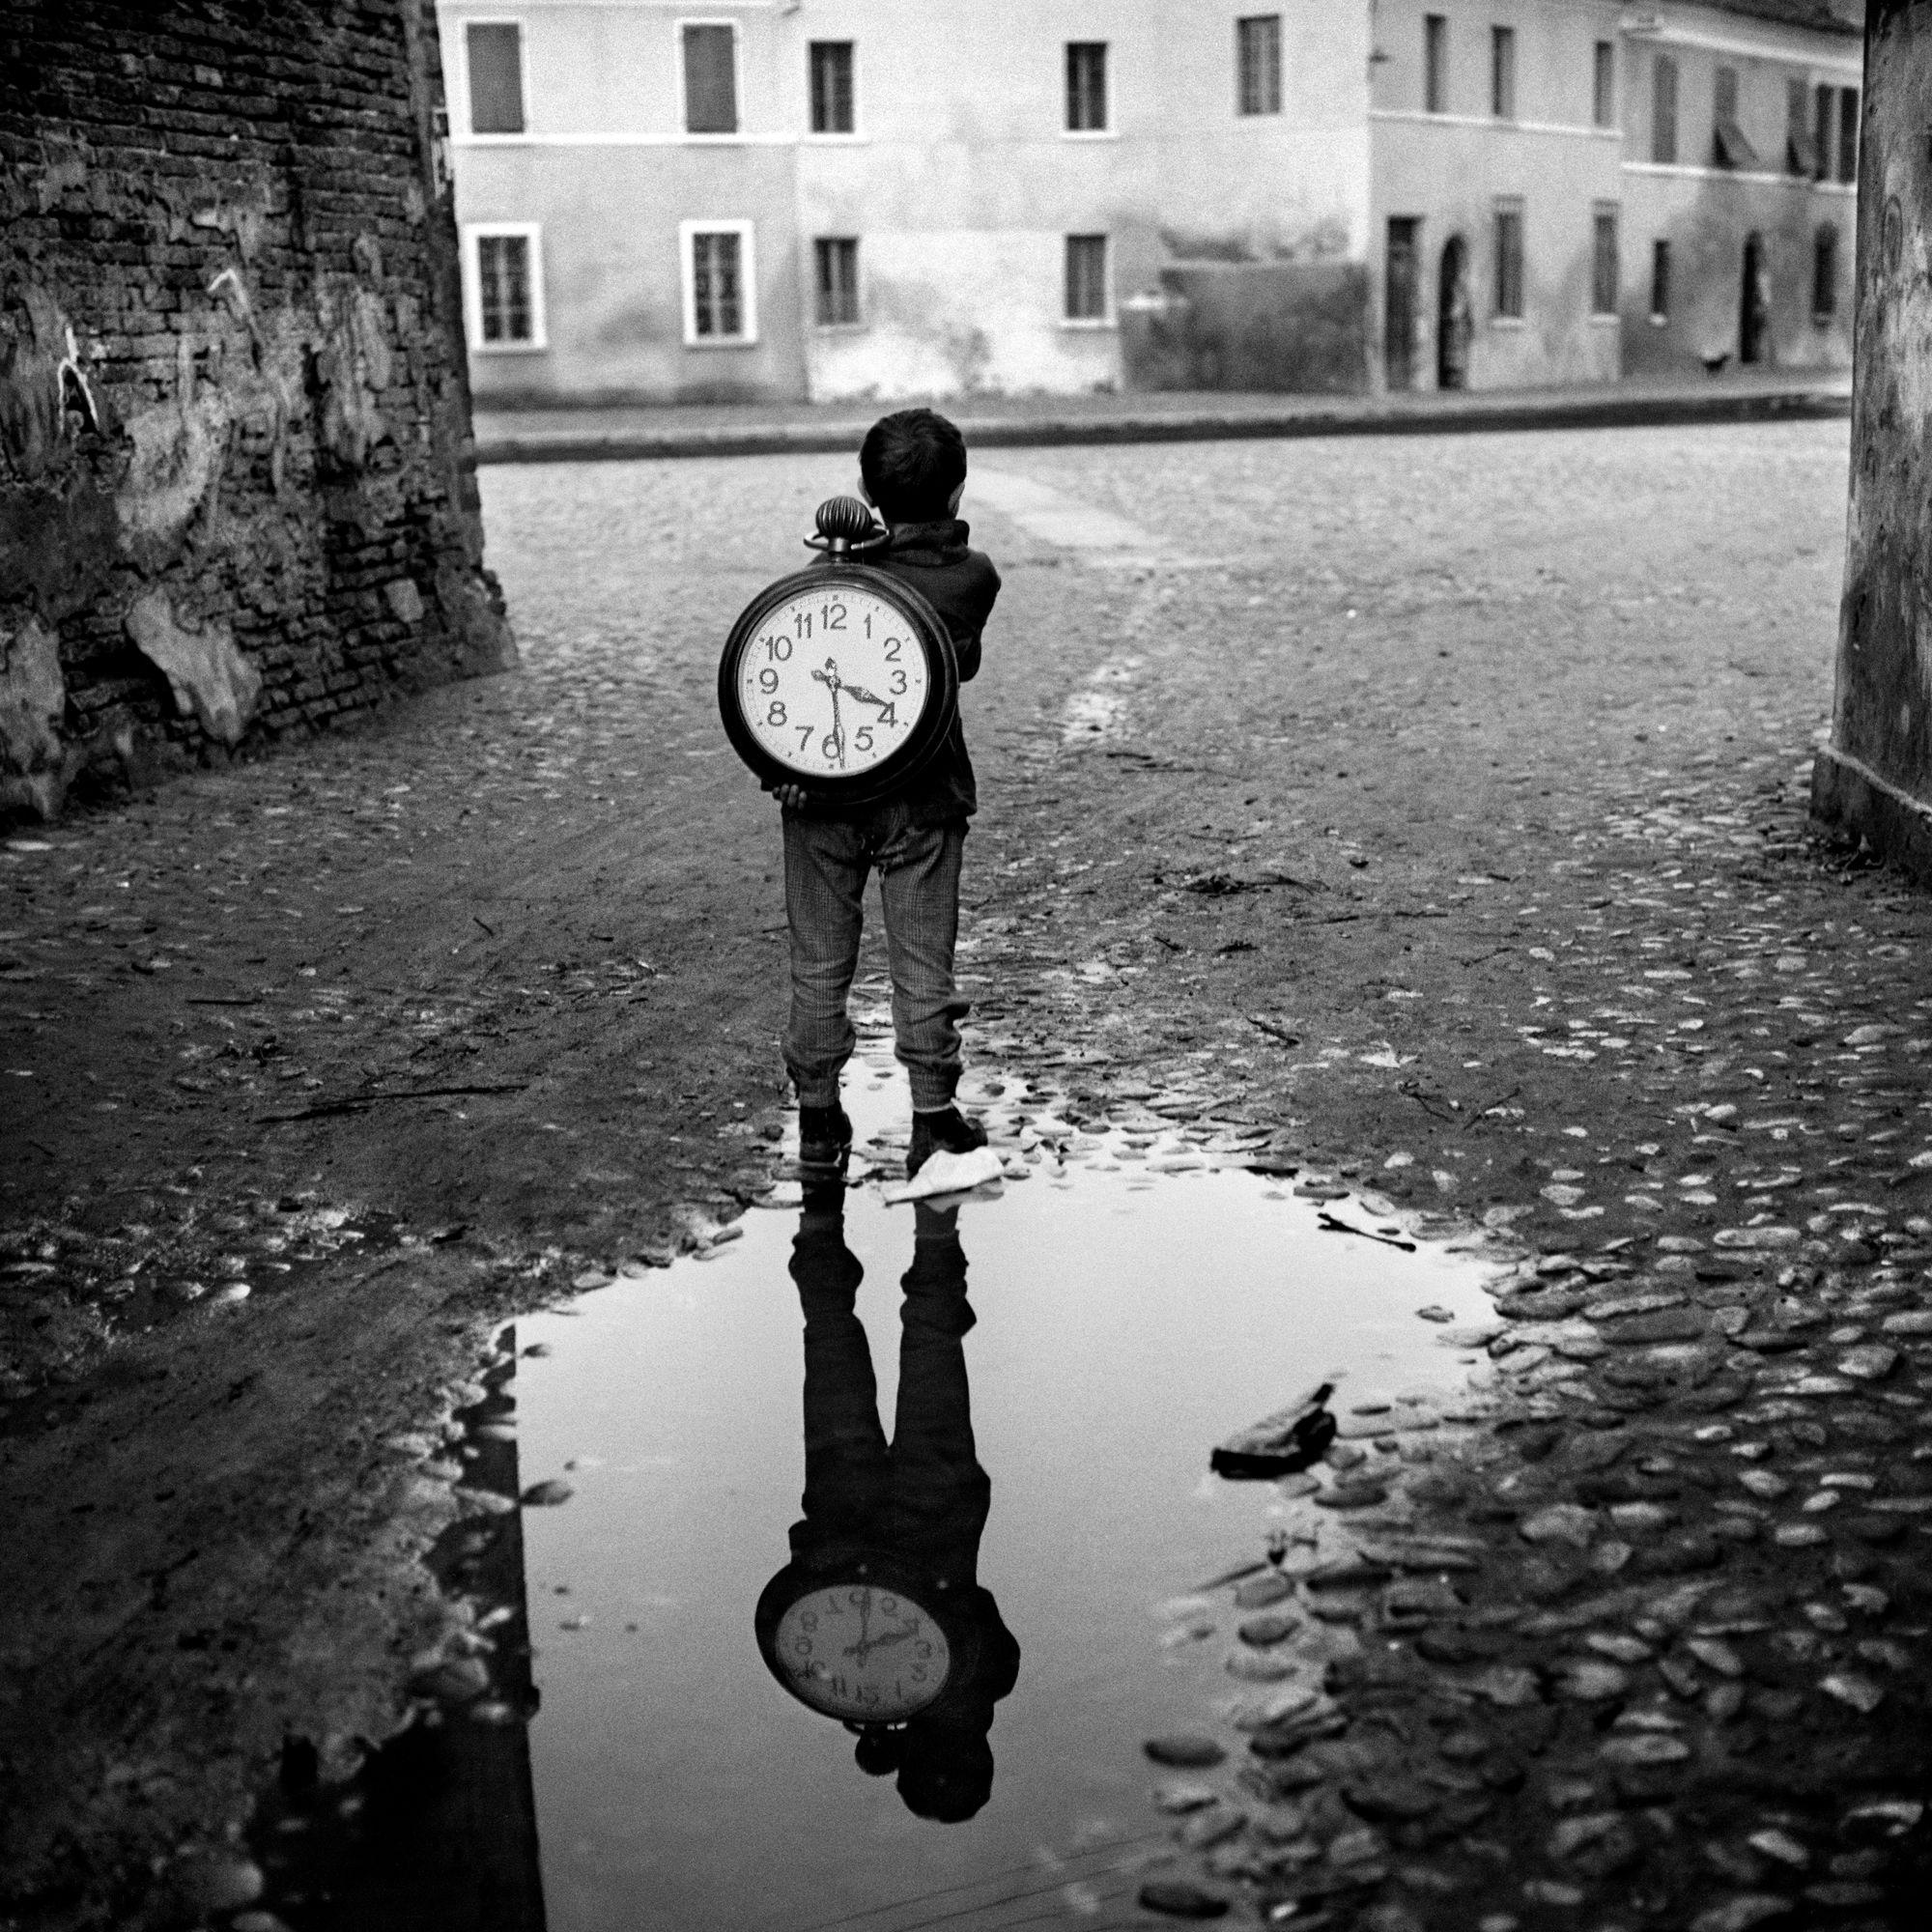 Neorealism: Gianni Berengo Gardin Photography